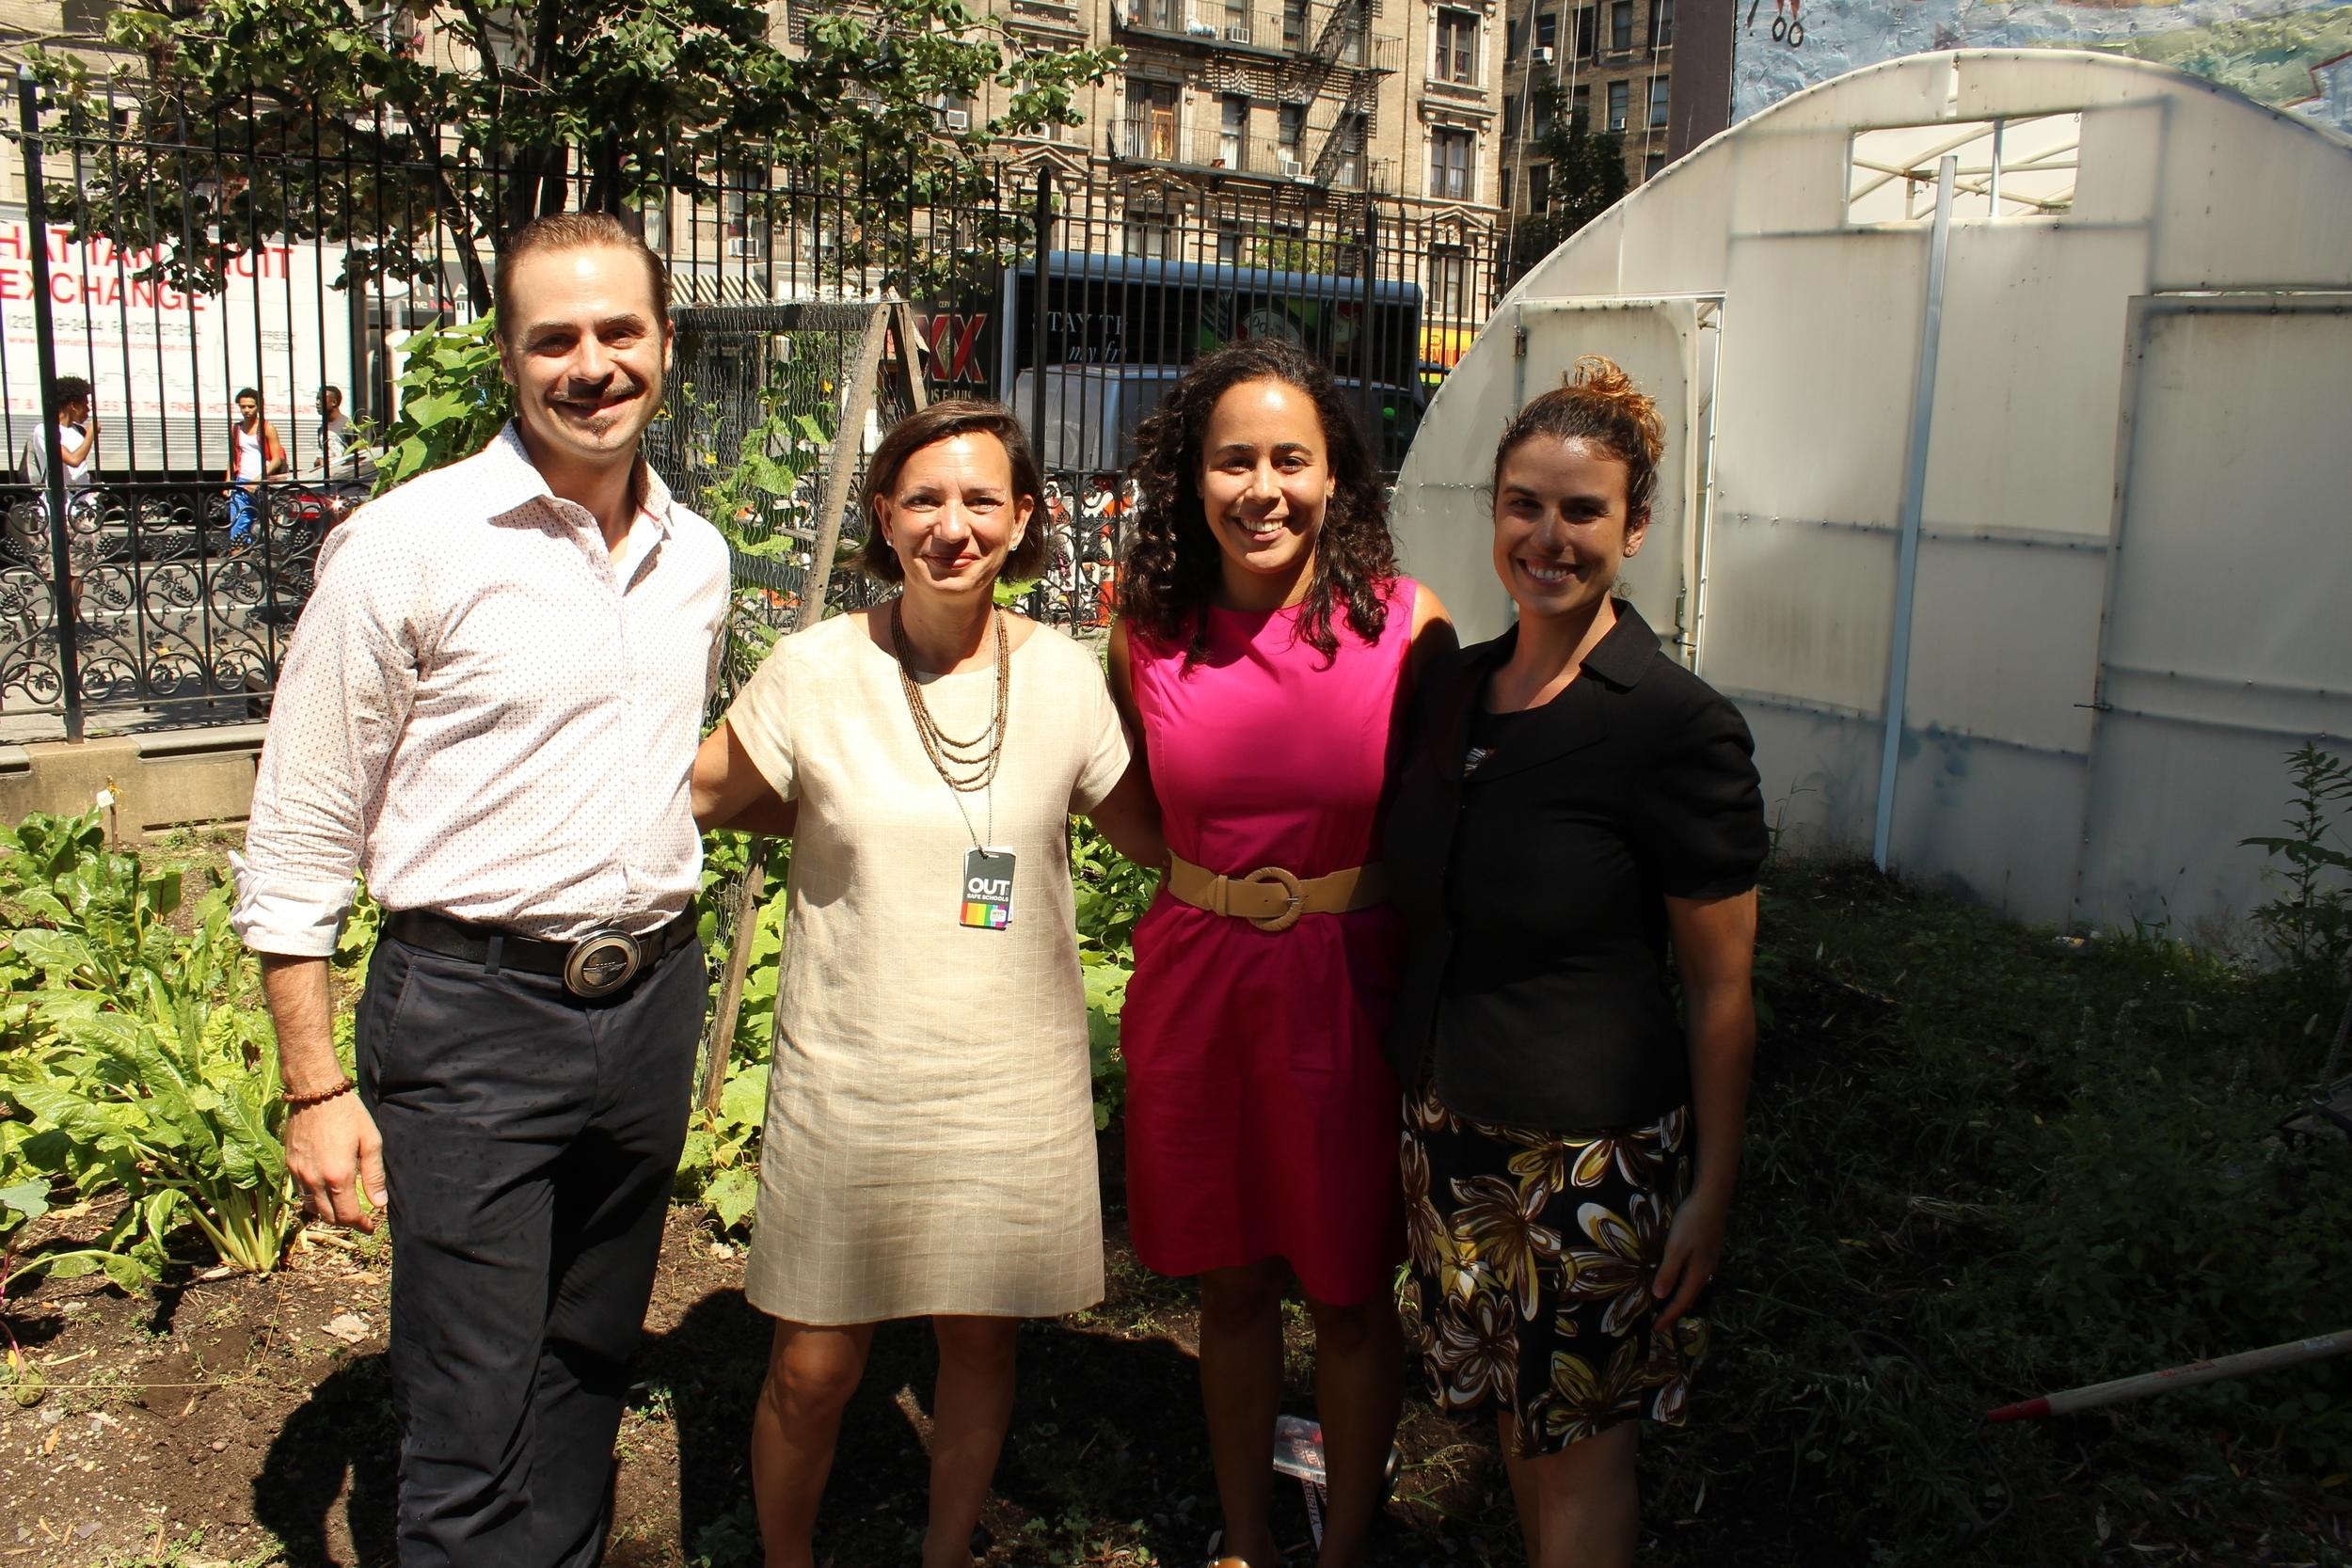 From left:Assistant Principal Luke Janka, Deputy Chancellor Elizabeth Rose, Principal Madeleine Ciliotta-Youn, and new Assistant Principal Daphne LaBua-Stenzel